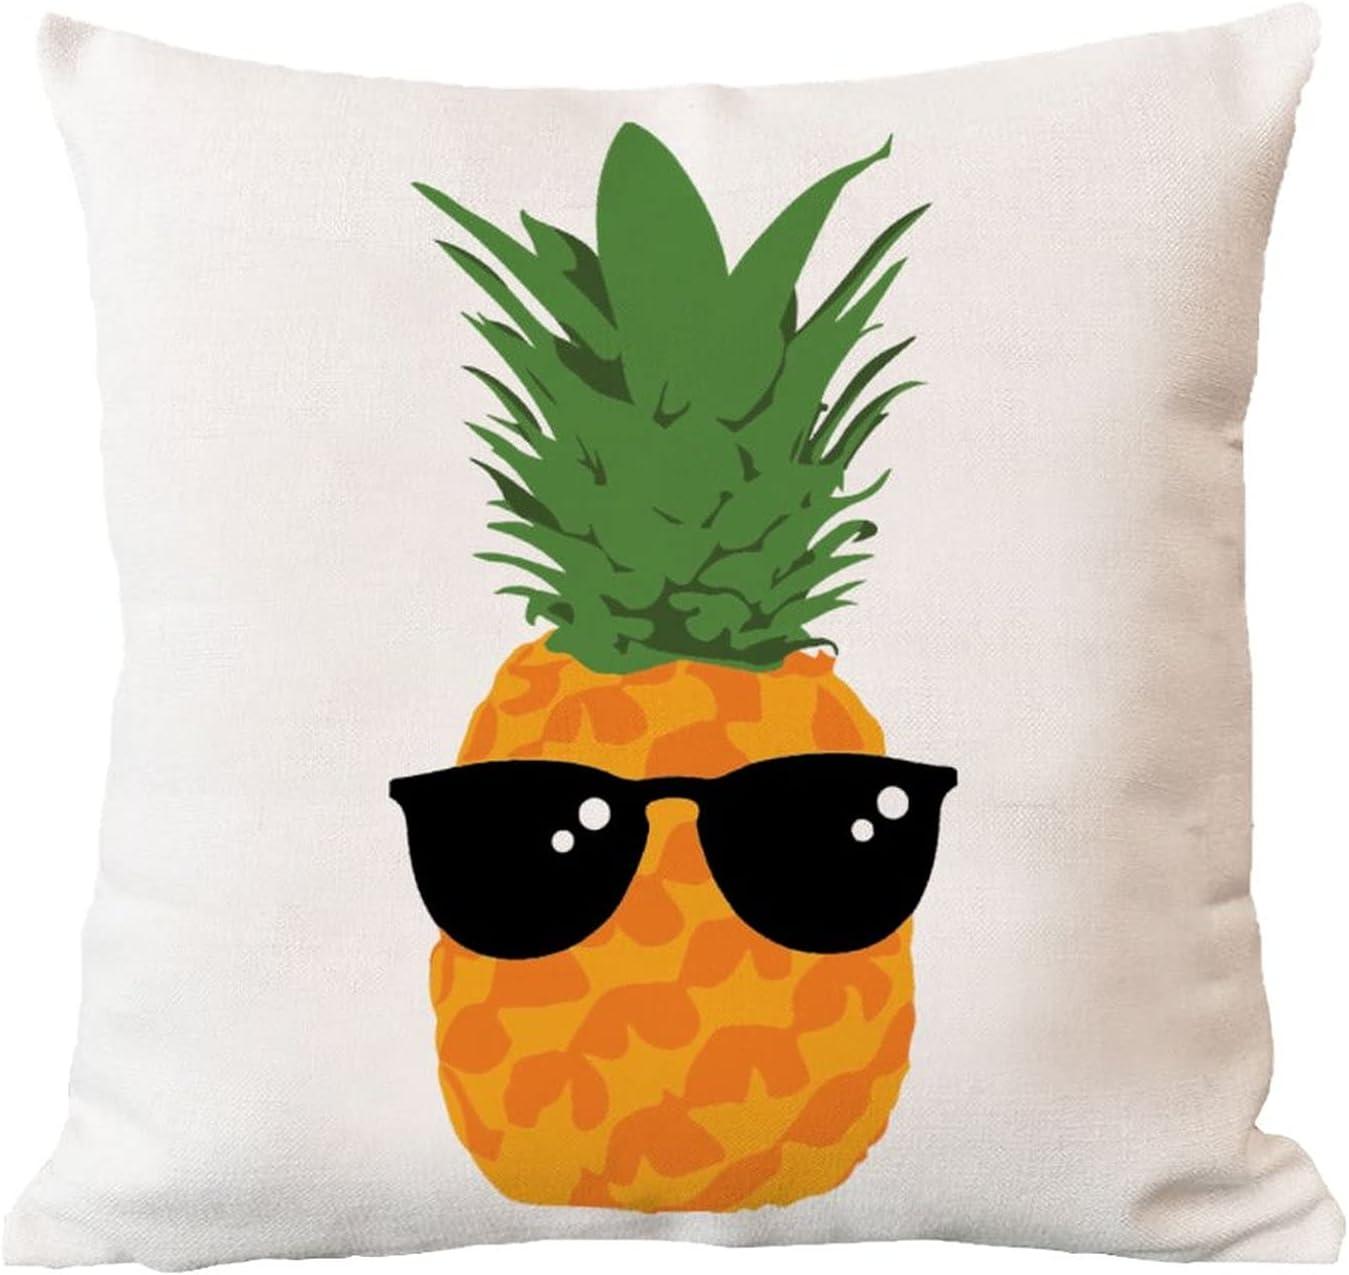 ArogGeld Genuine Waterproof Cushion Cover Drink Low price Pineapple with Sungalsse